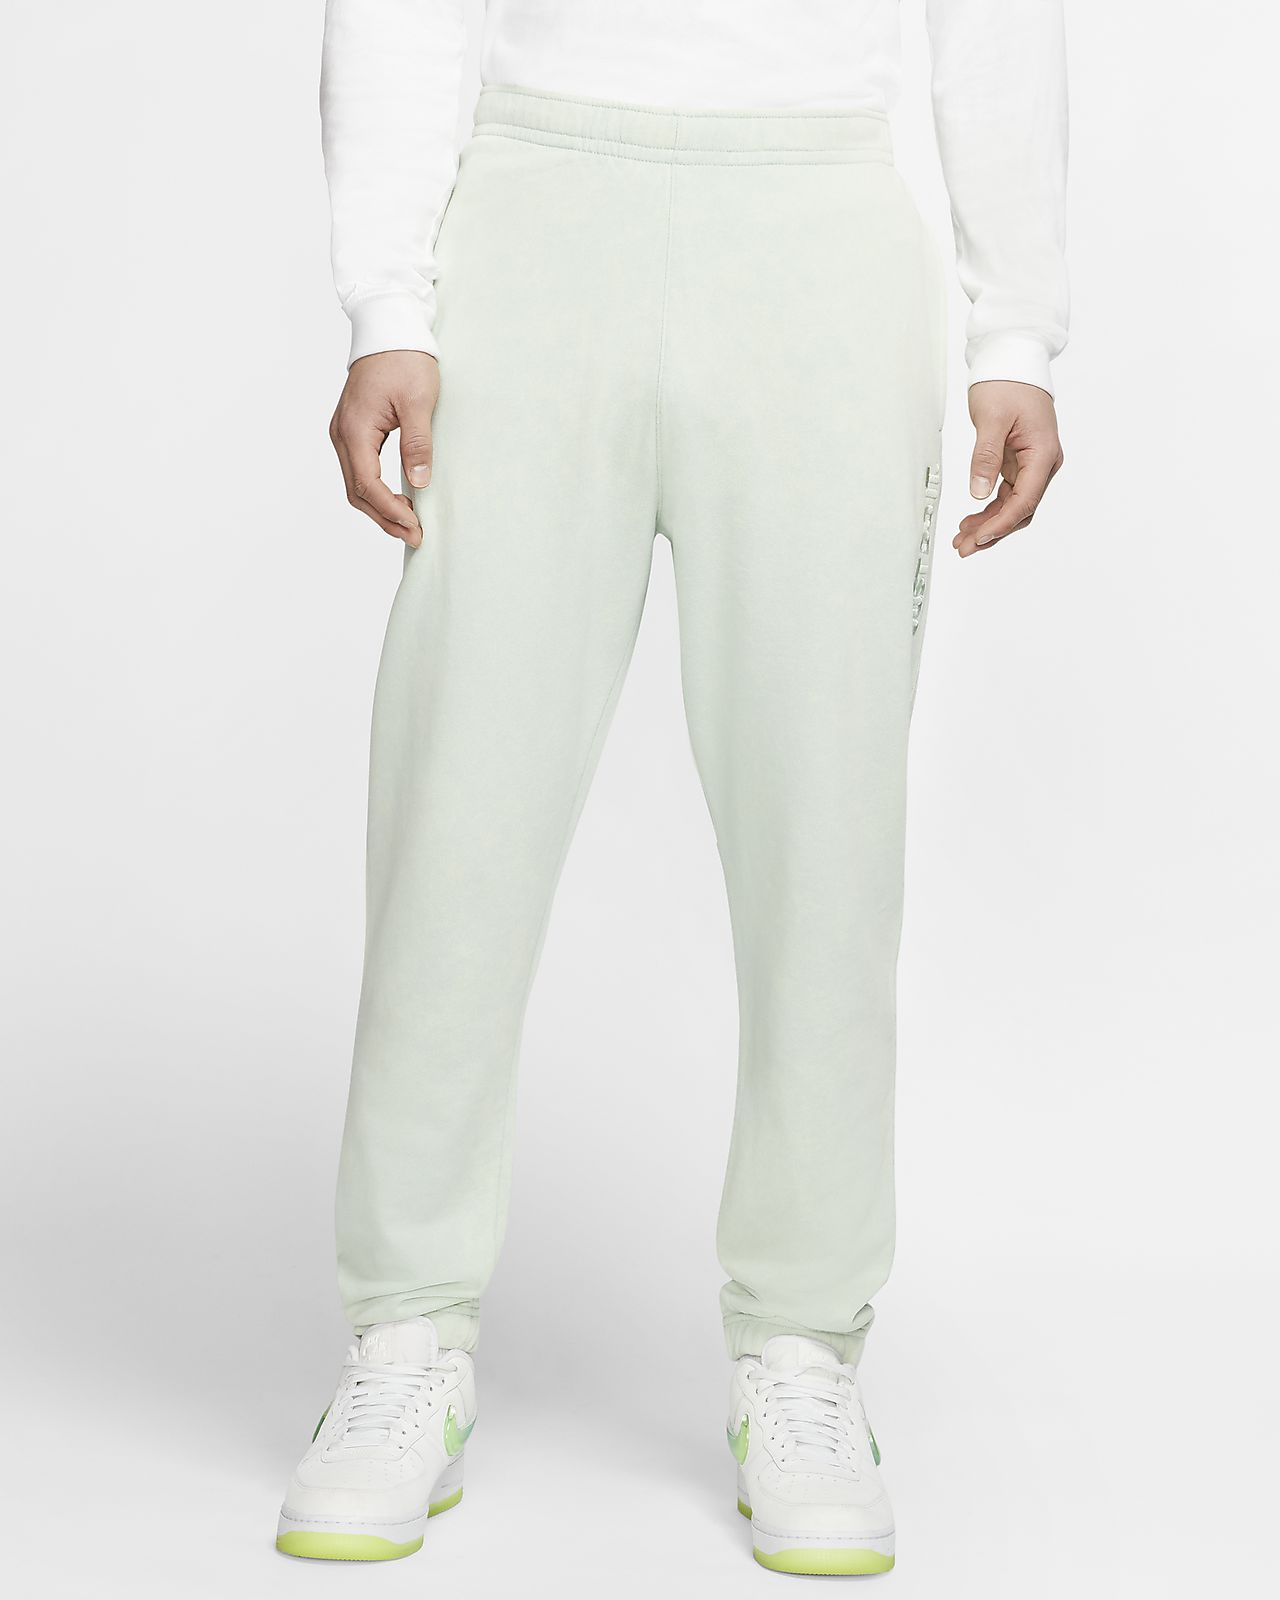 pantalon molleton homme nike